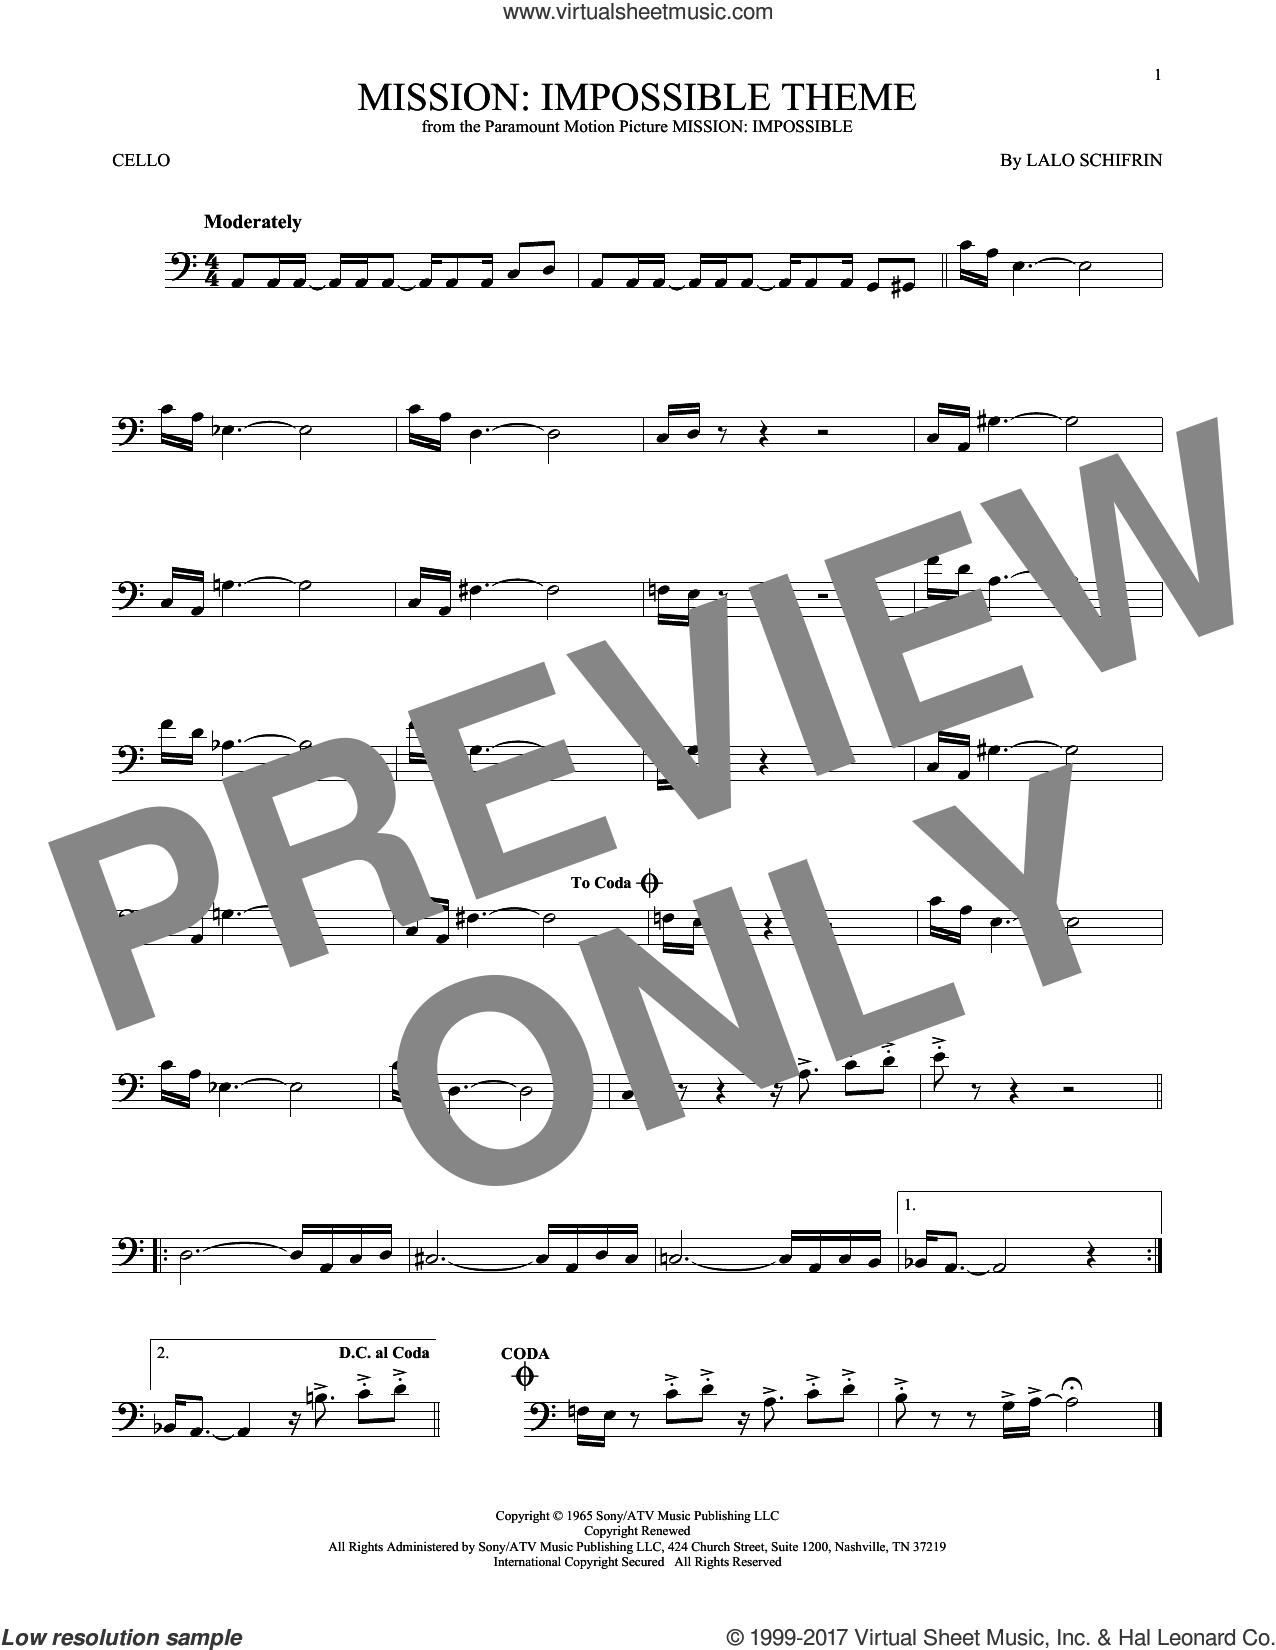 Mission: Impossible Theme sheet music for cello solo by Lalo Schifrin, intermediate skill level